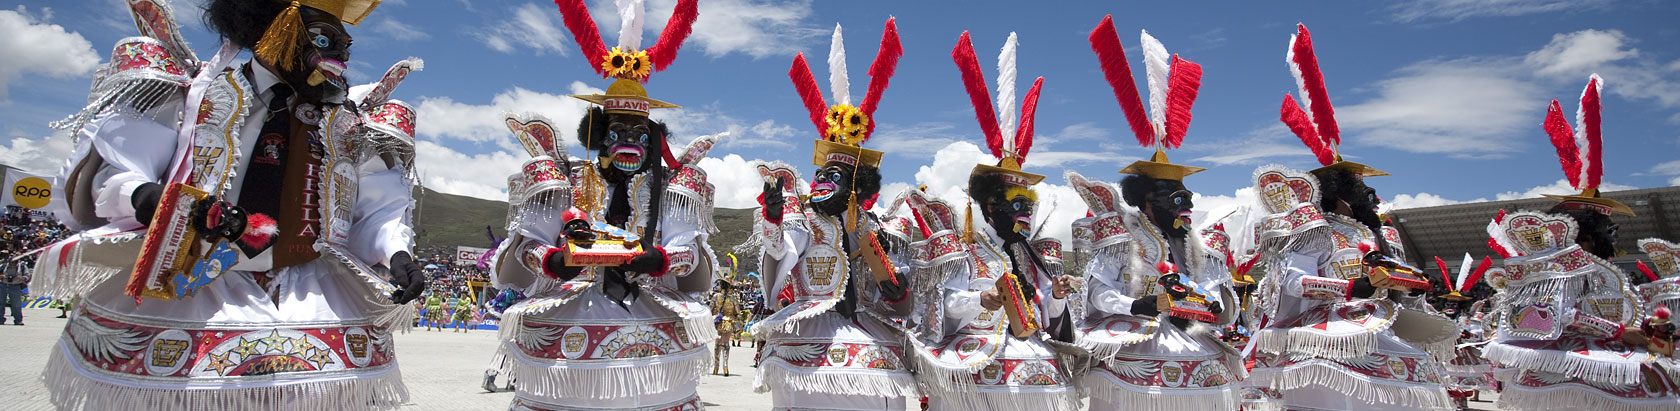 Fiesta Patronal de la Virgen de la Candelaria © Renzo Giraldo / PromPerú